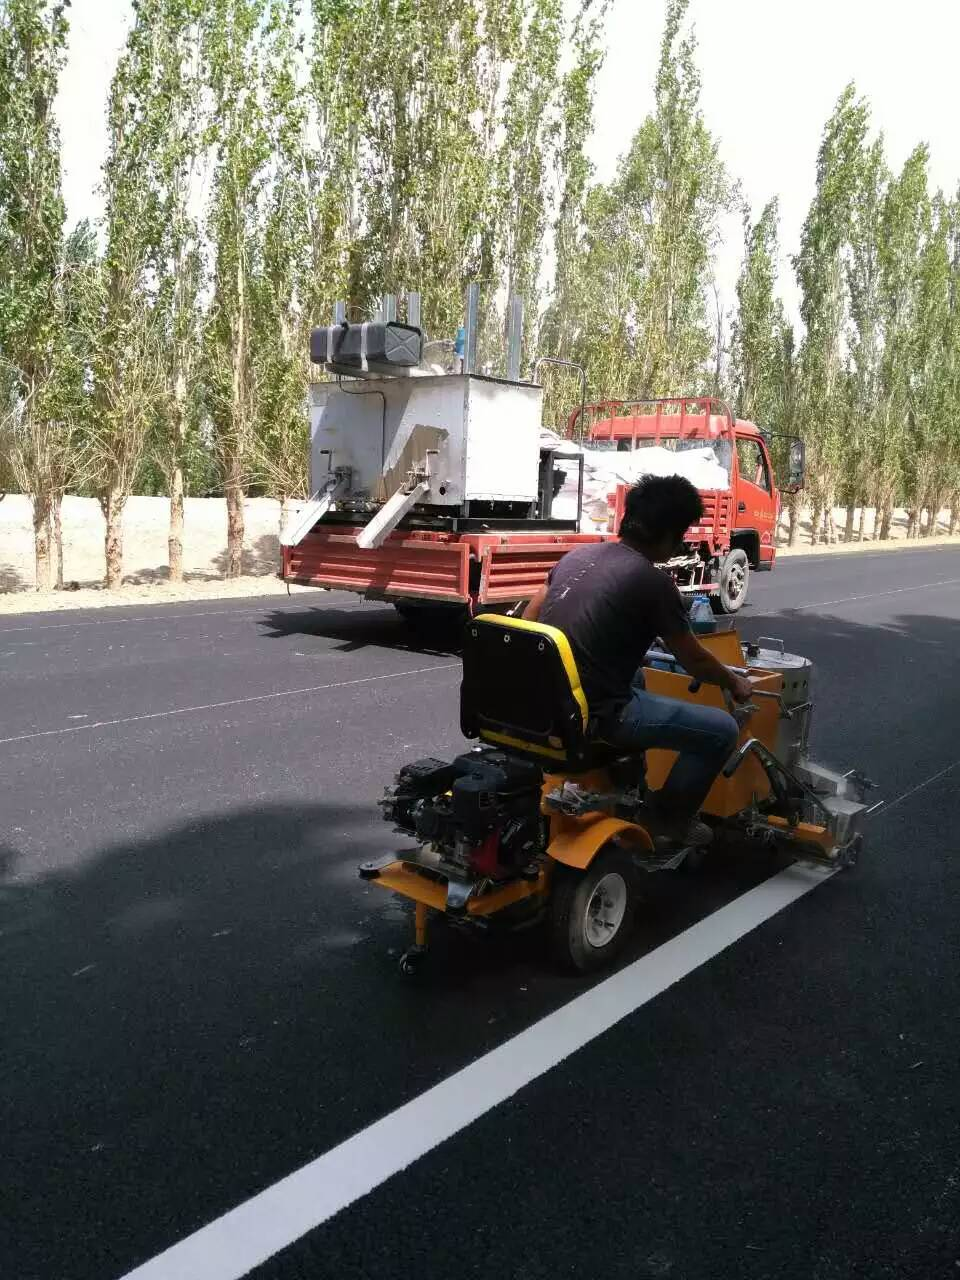 LXD320 thermoplastic road marking machine